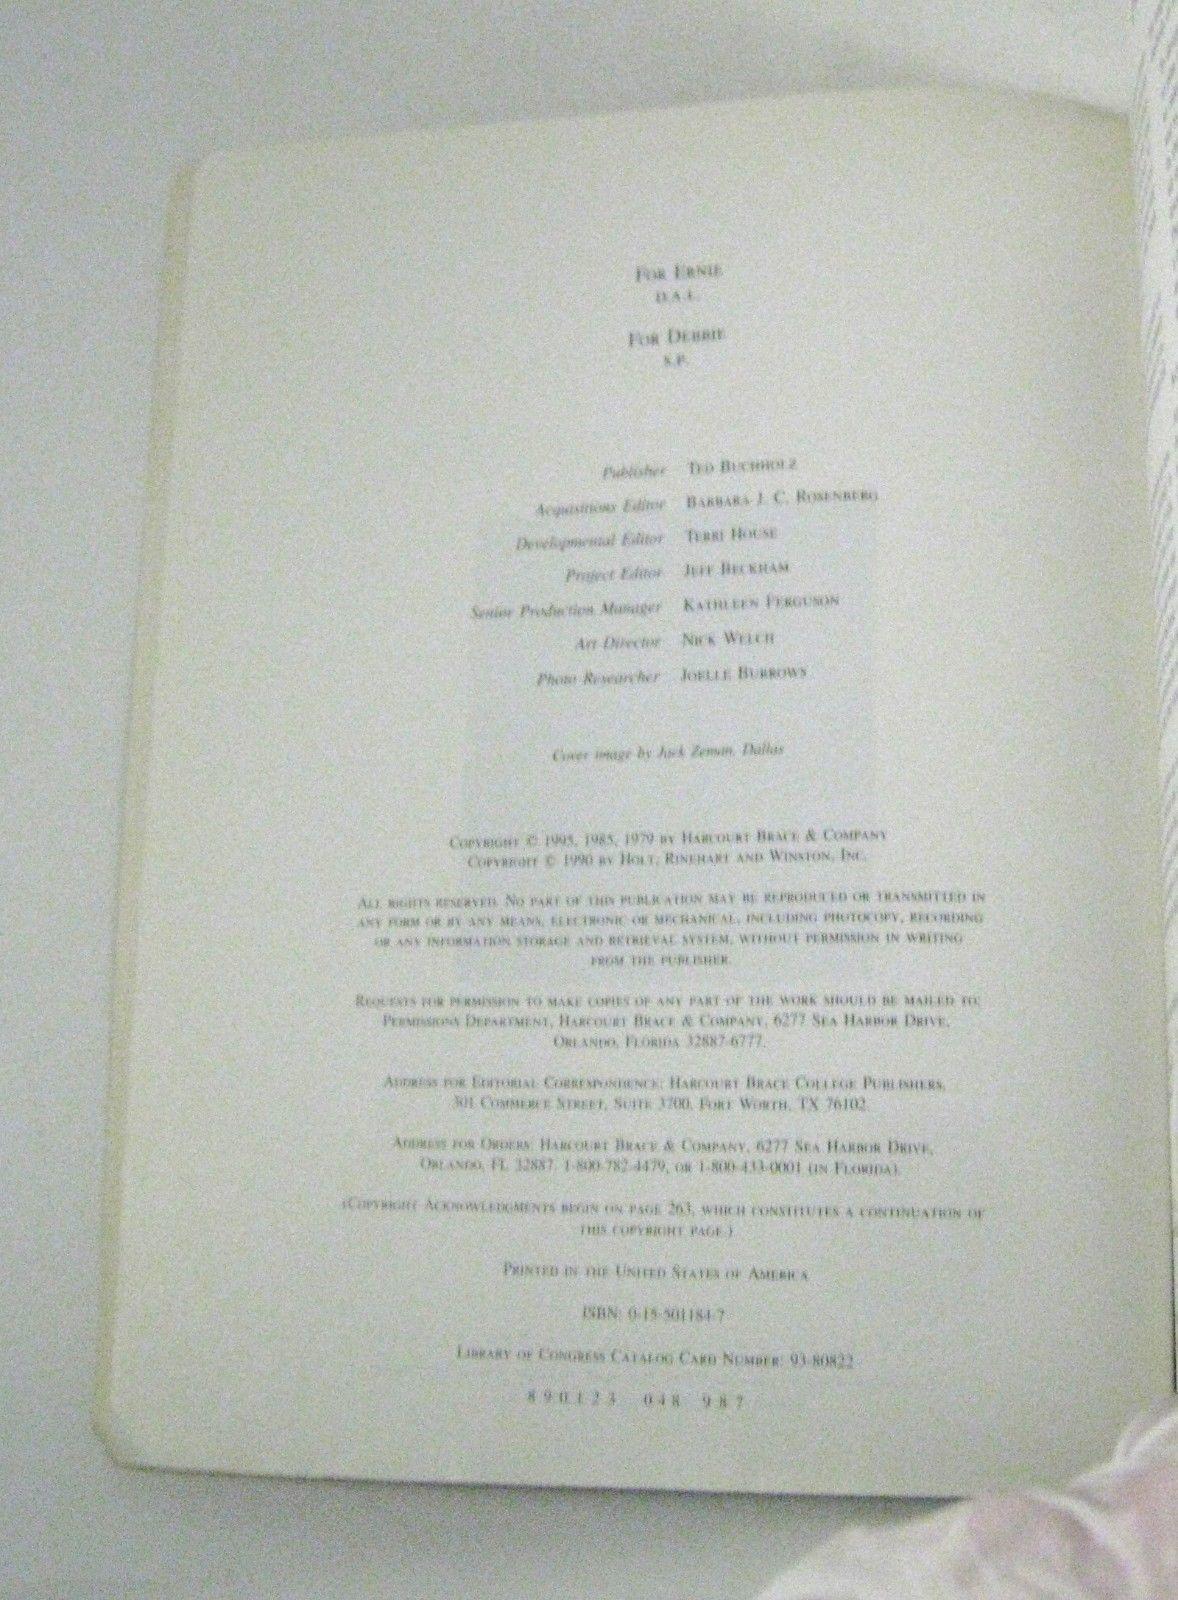 Design Basics by David Lauer 4th Edition Paperback 1994